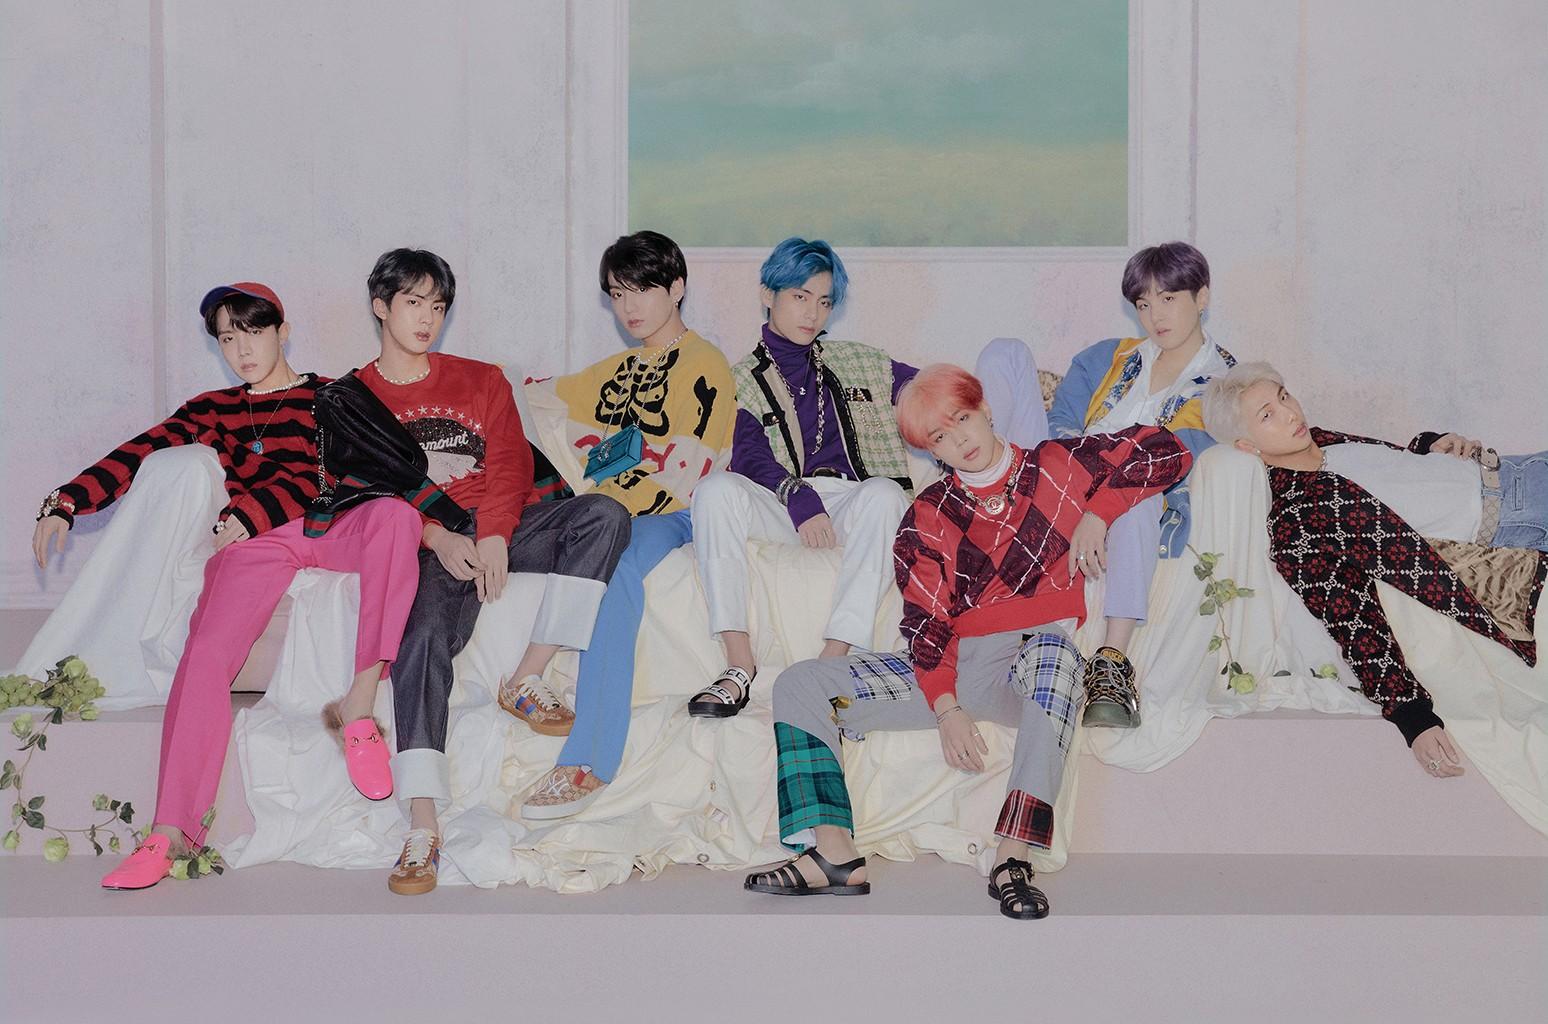 BTS press photo 12 2019 billboard 1548 compressed.